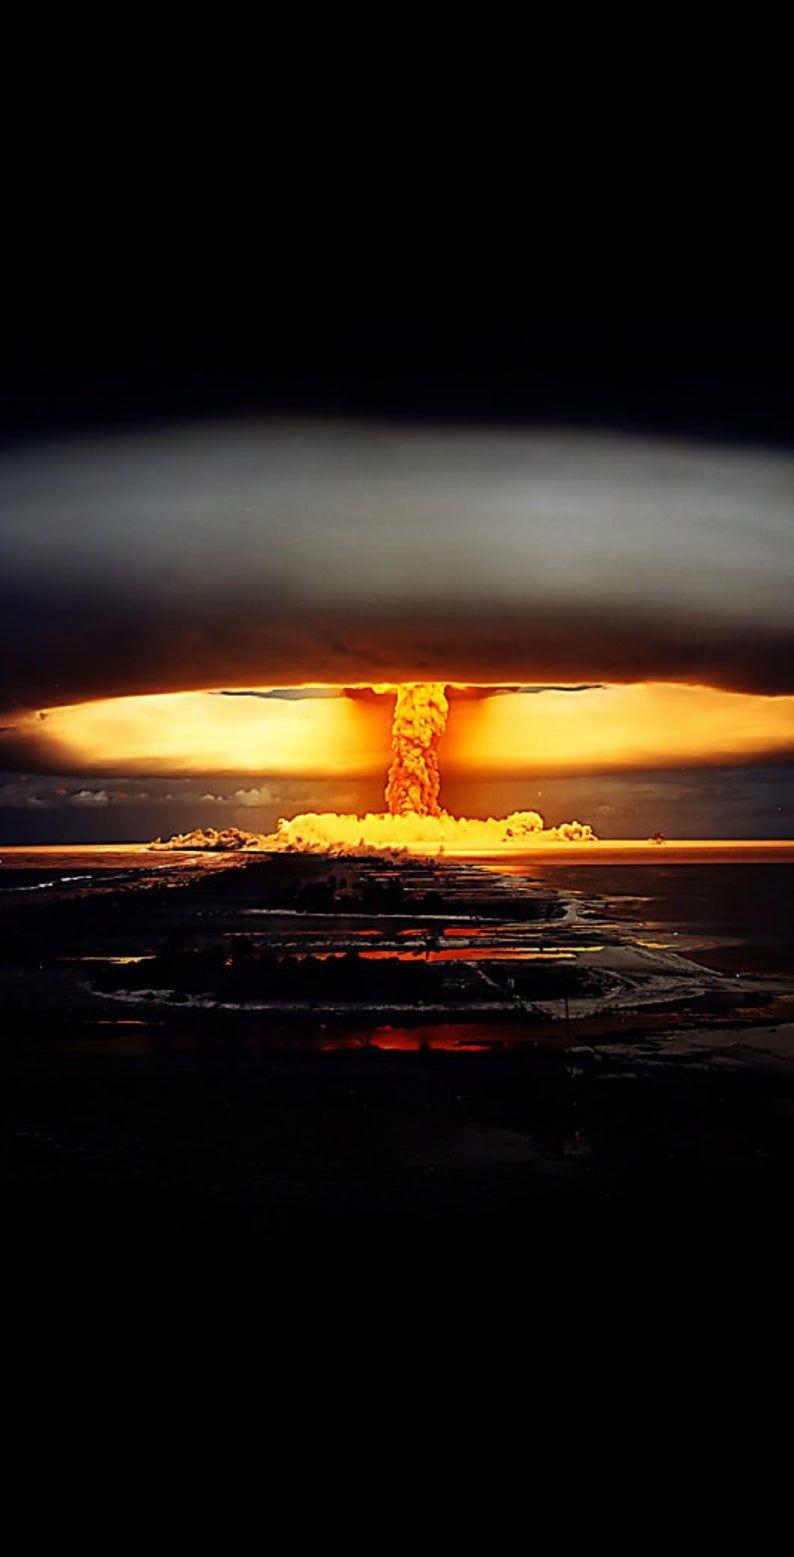 Nuclear ATOM Bomb Explosion Themed Cornhole Board Prints / Wraps   Corn Hole Wraps   Bag Toss   Corn Toss   Custom